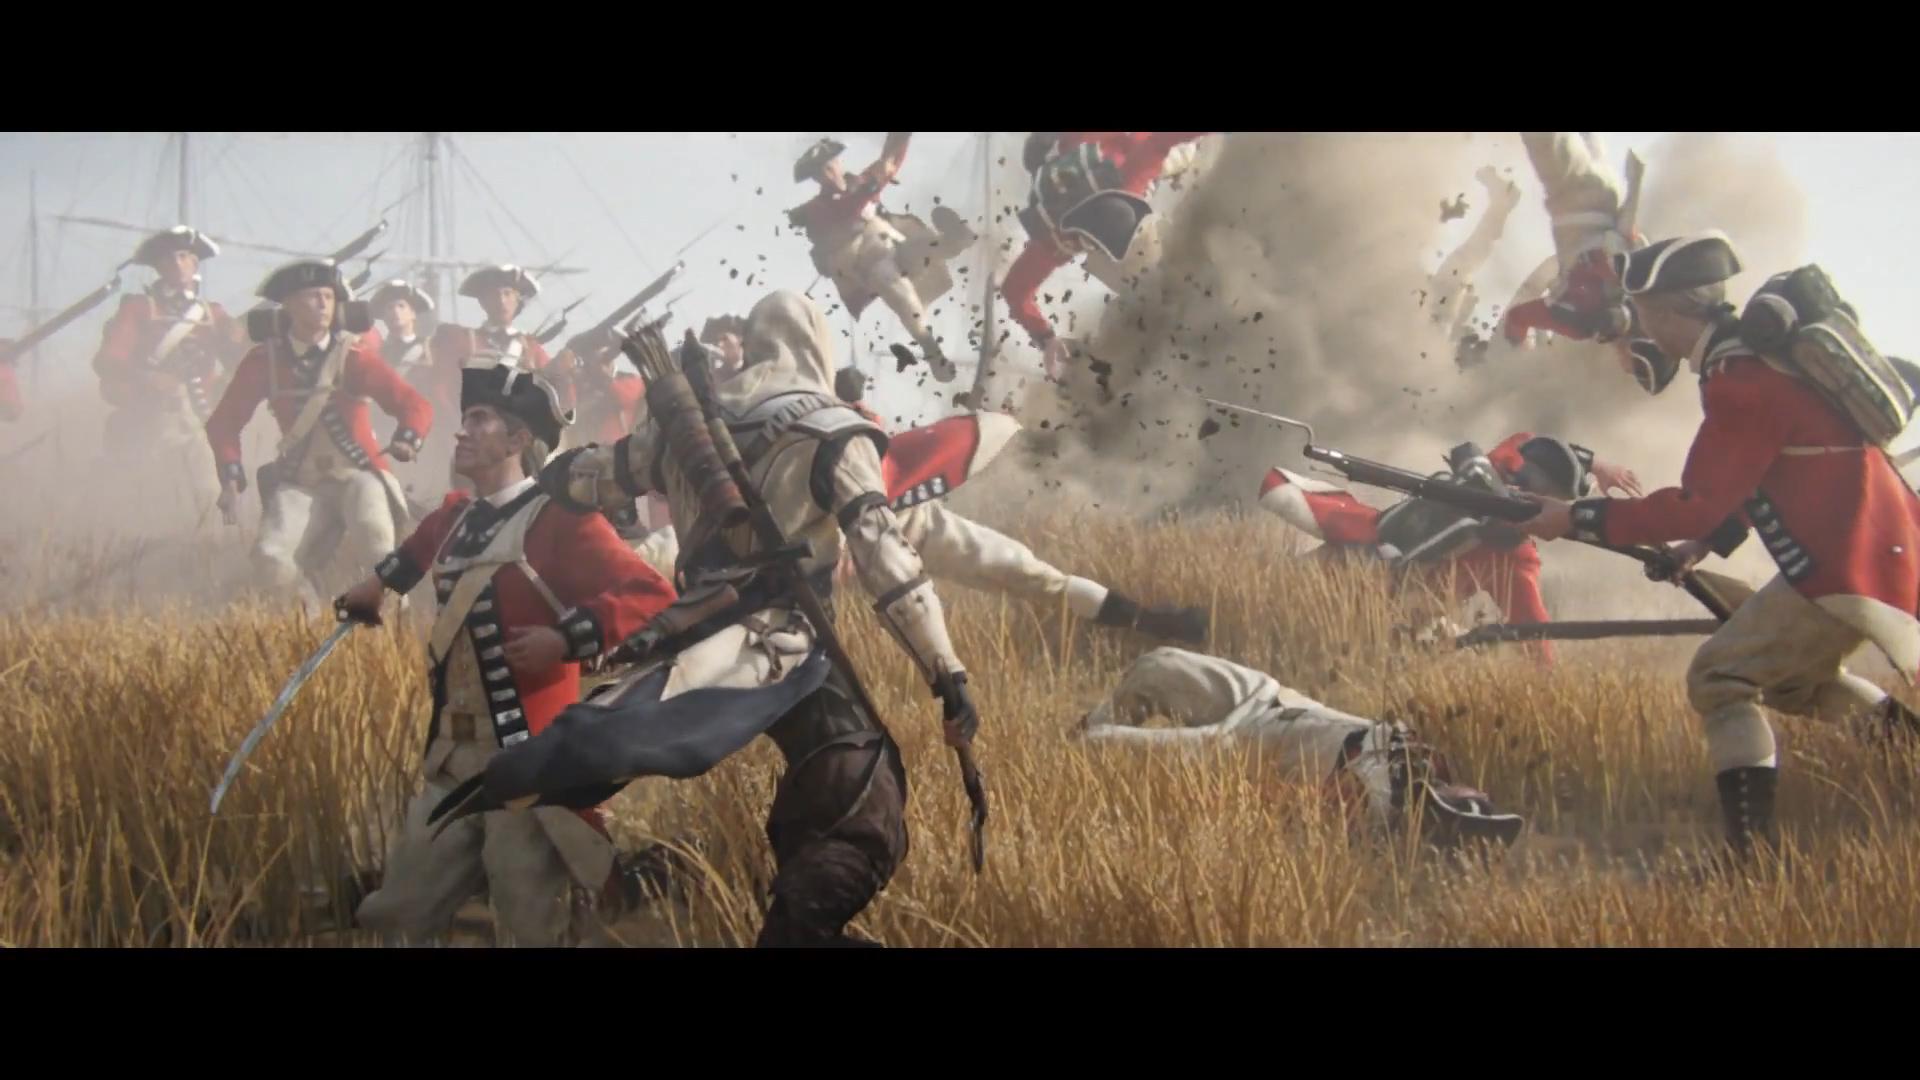 Assassins Creed III Image